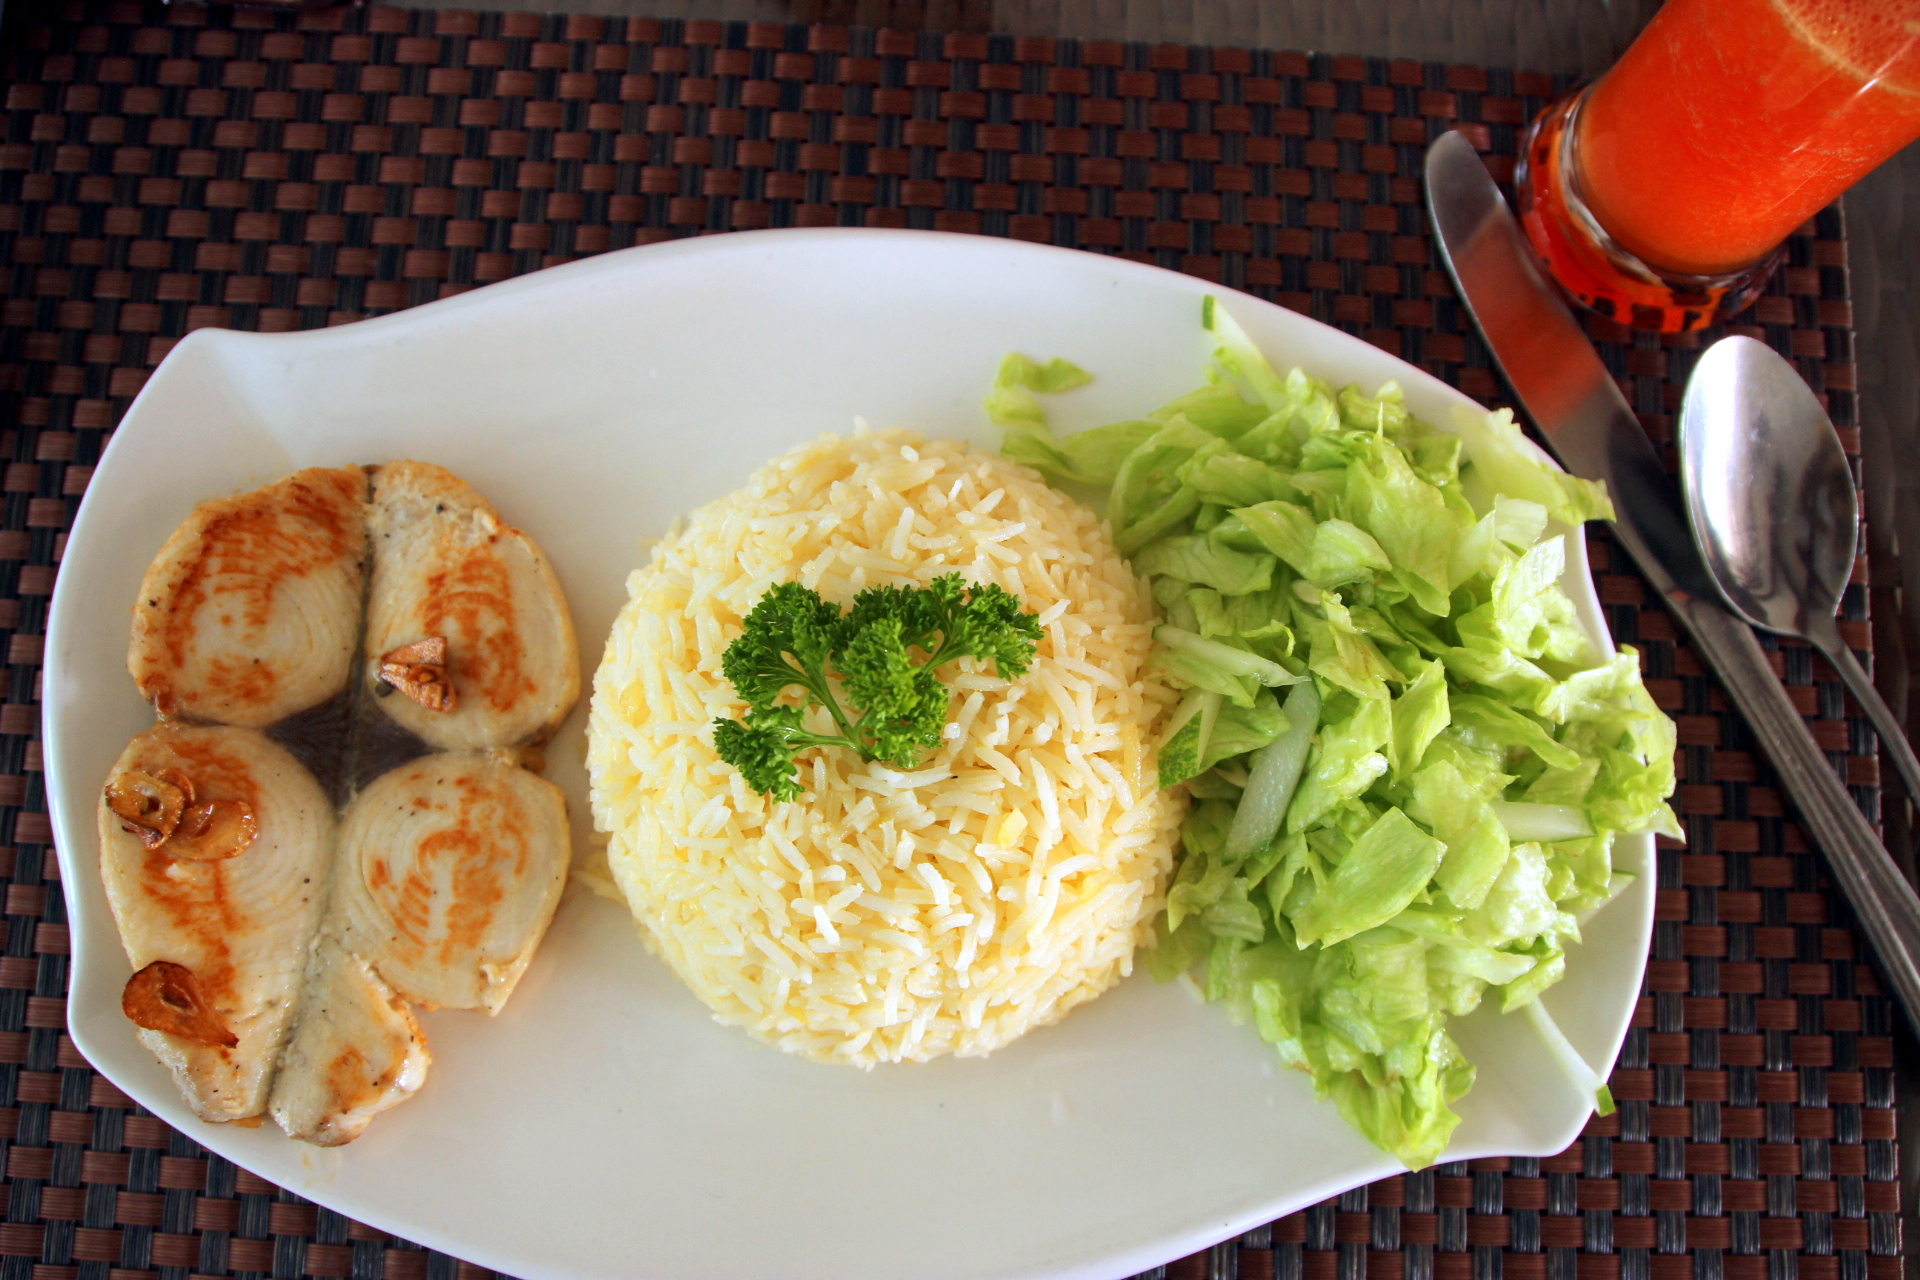 Maldiives food